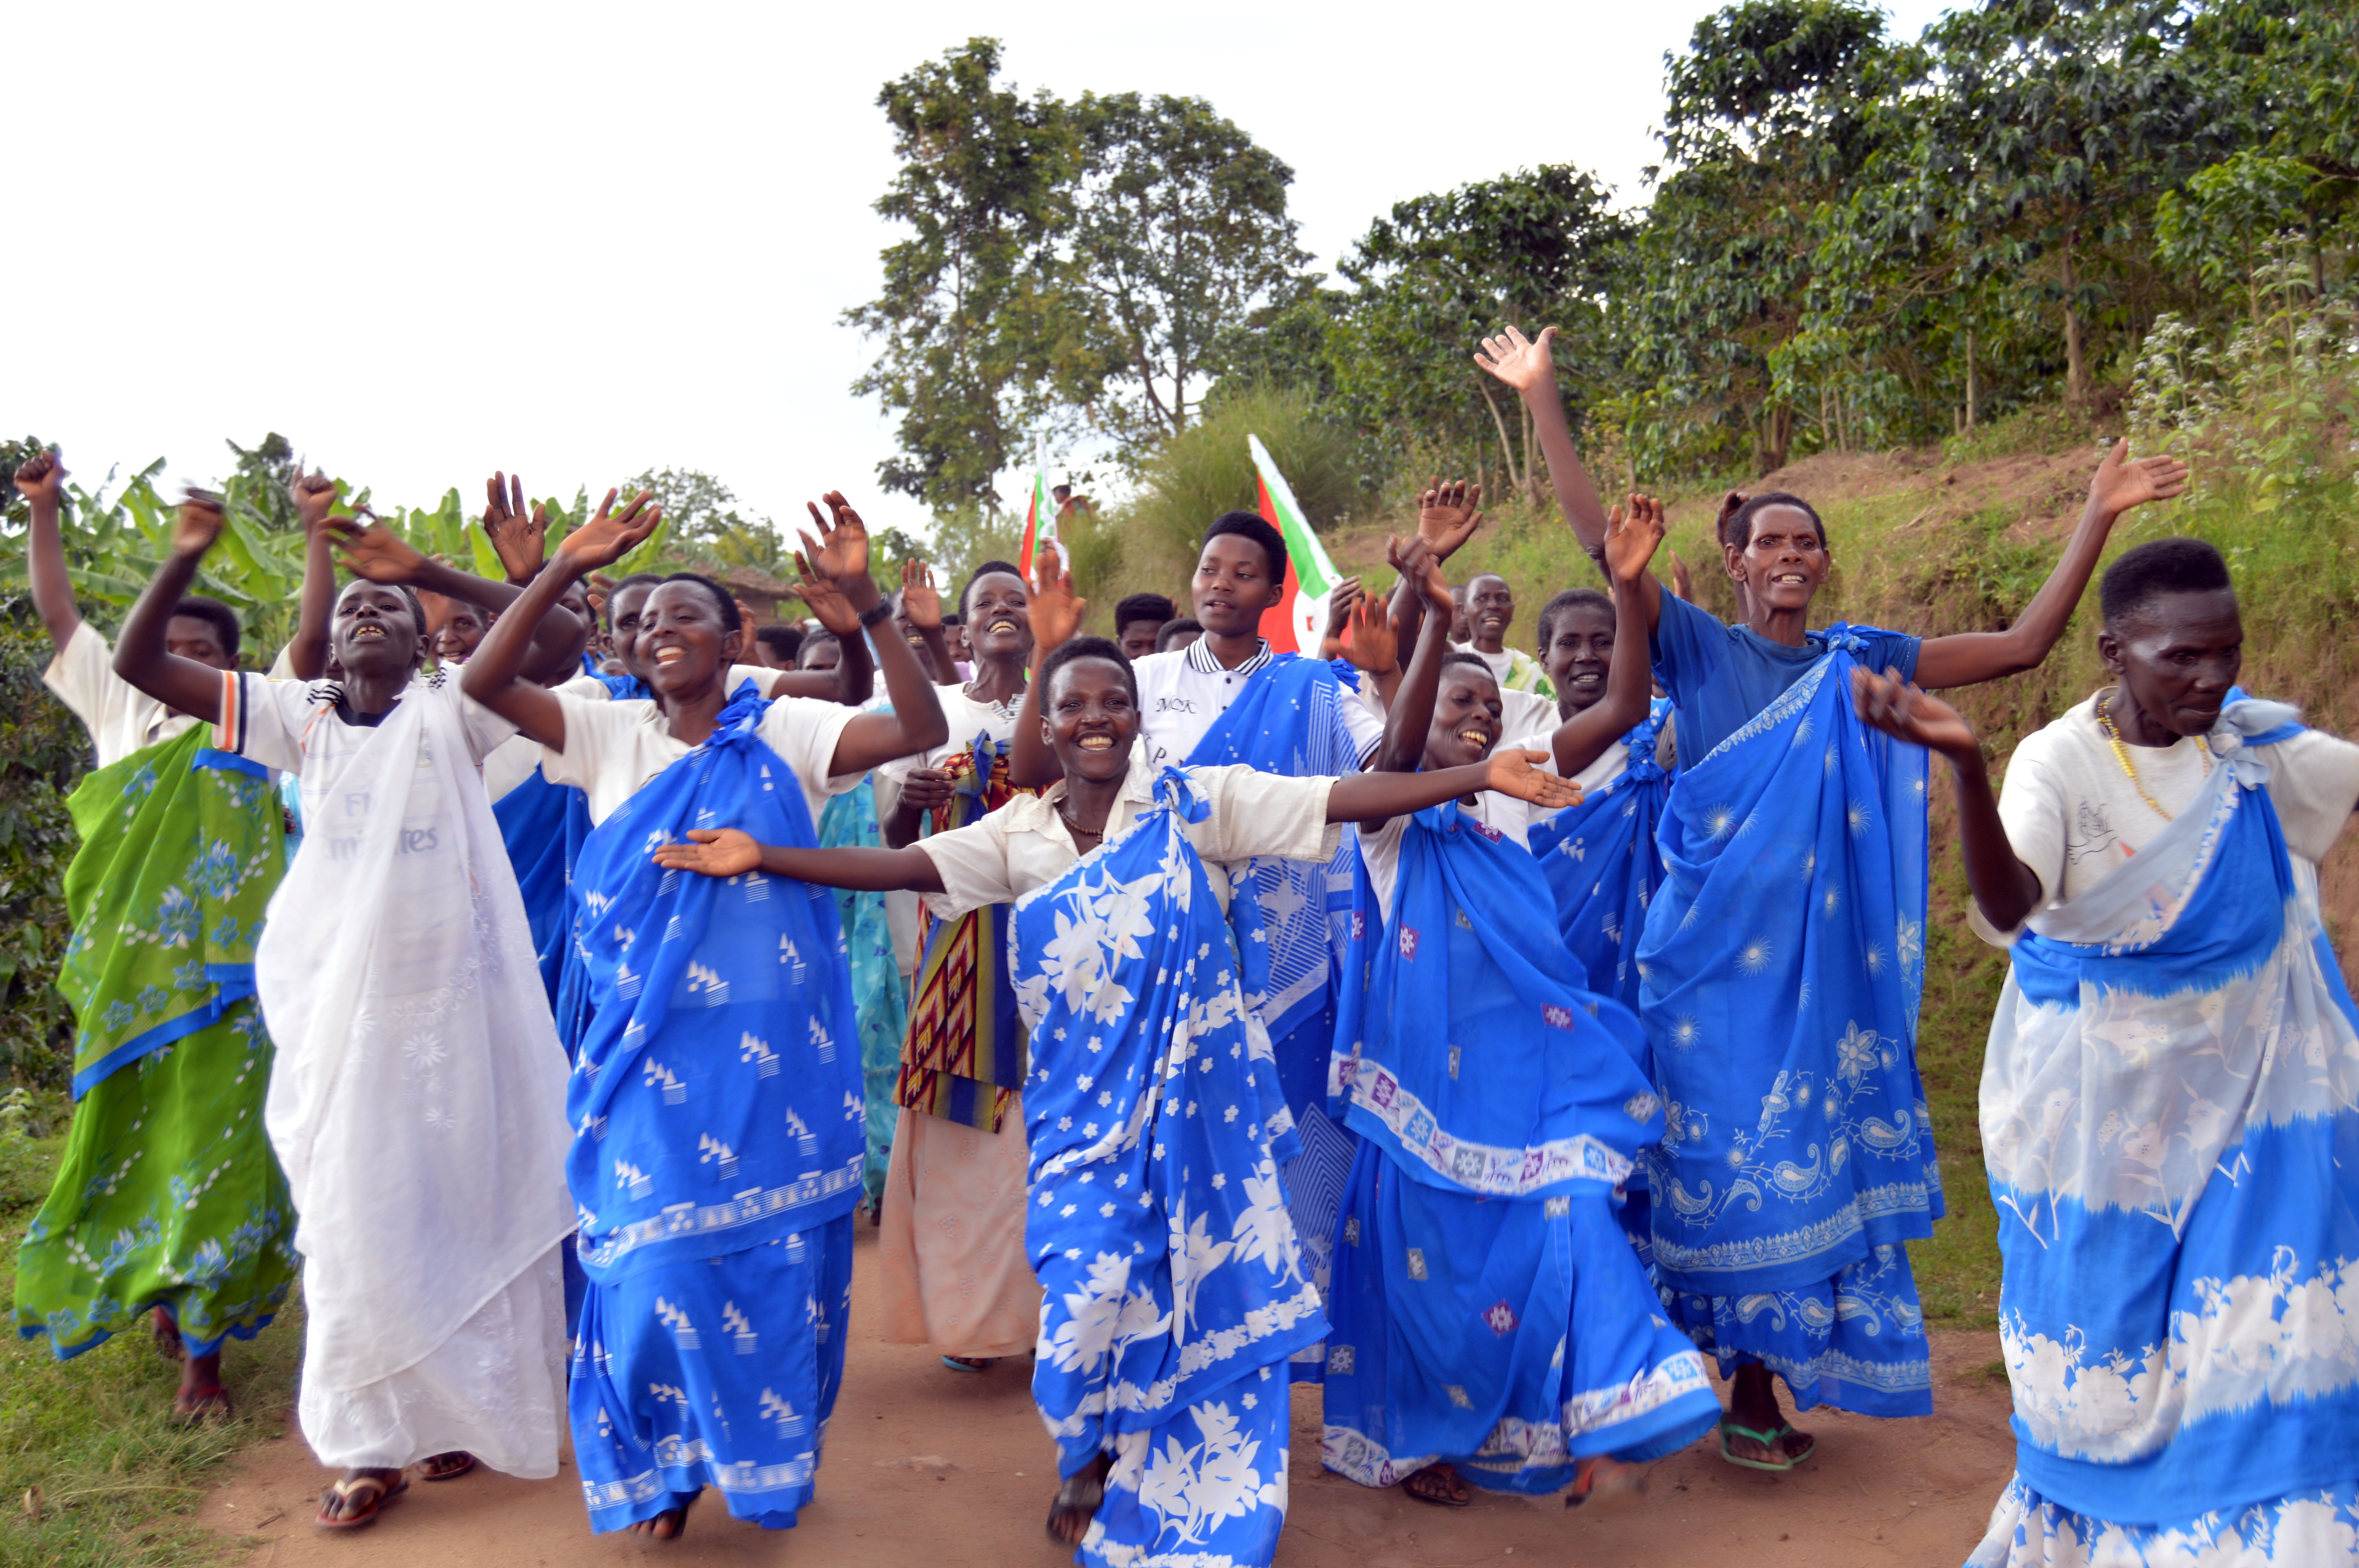 JNP-coffees-Burundi-Microlots-13